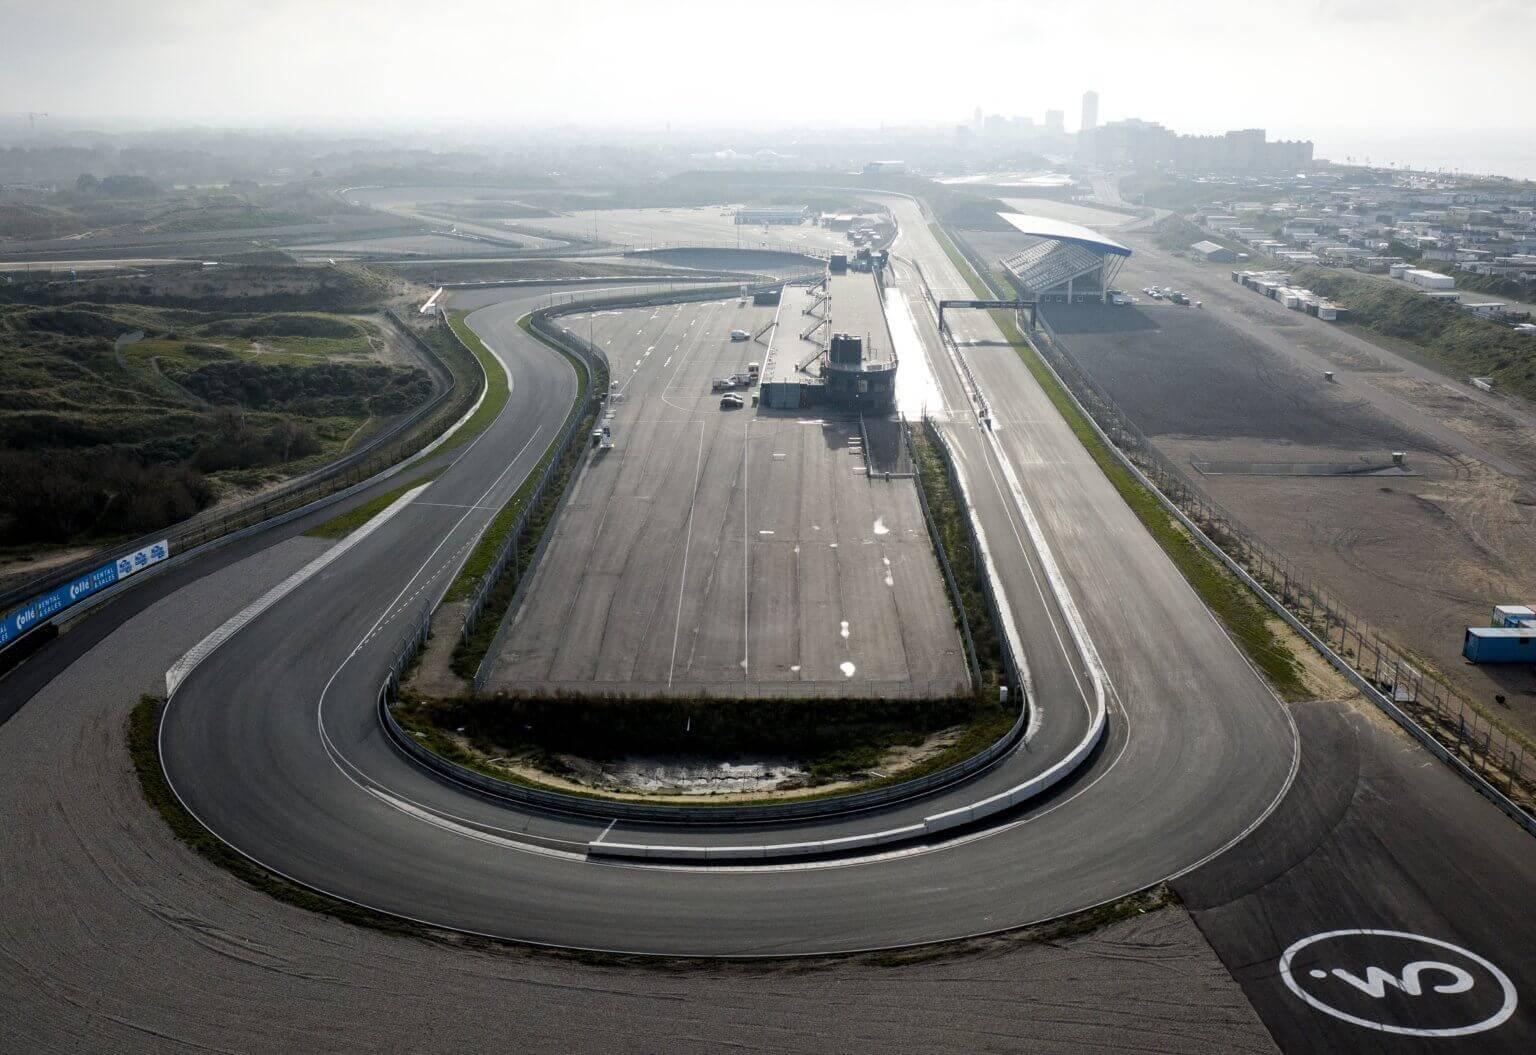 Formula 1 2021, Formula 1 2021 season preview